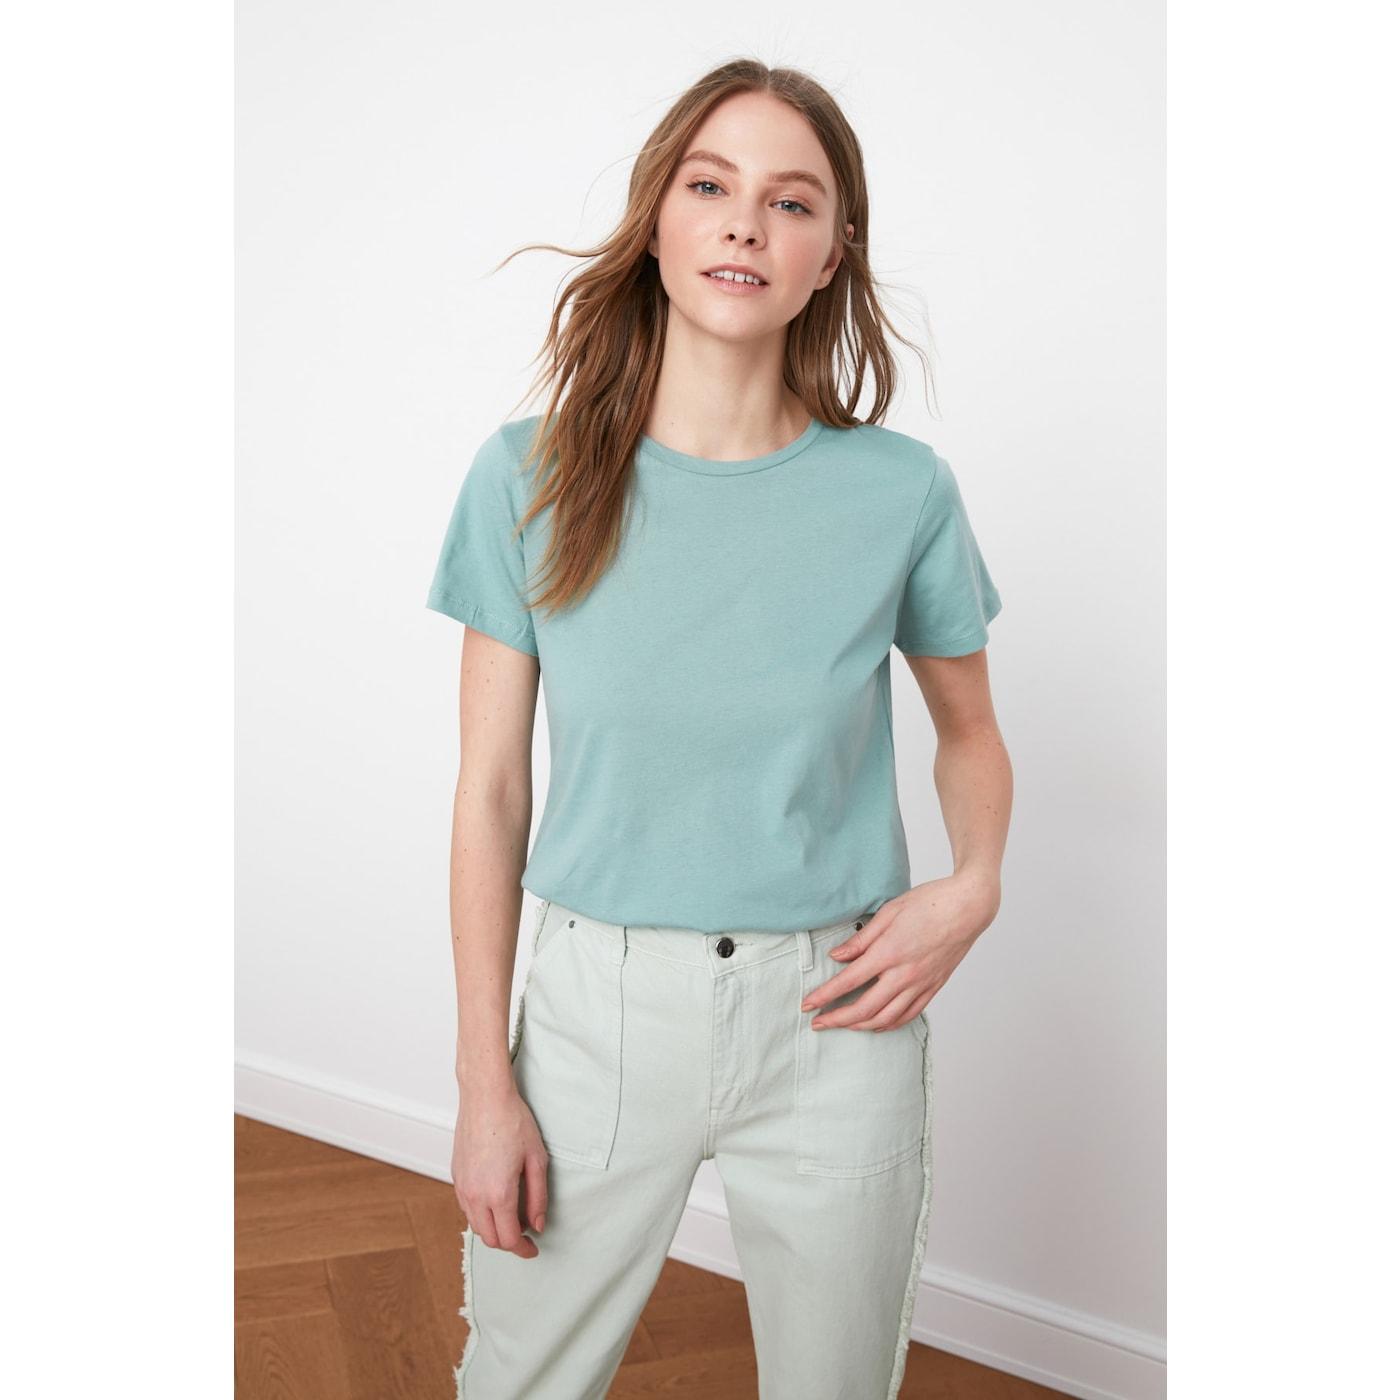 Trendyol Mint 100% Cotton Süprem Bicycle Collar Basic Knitted T-Shirt dámské XXL